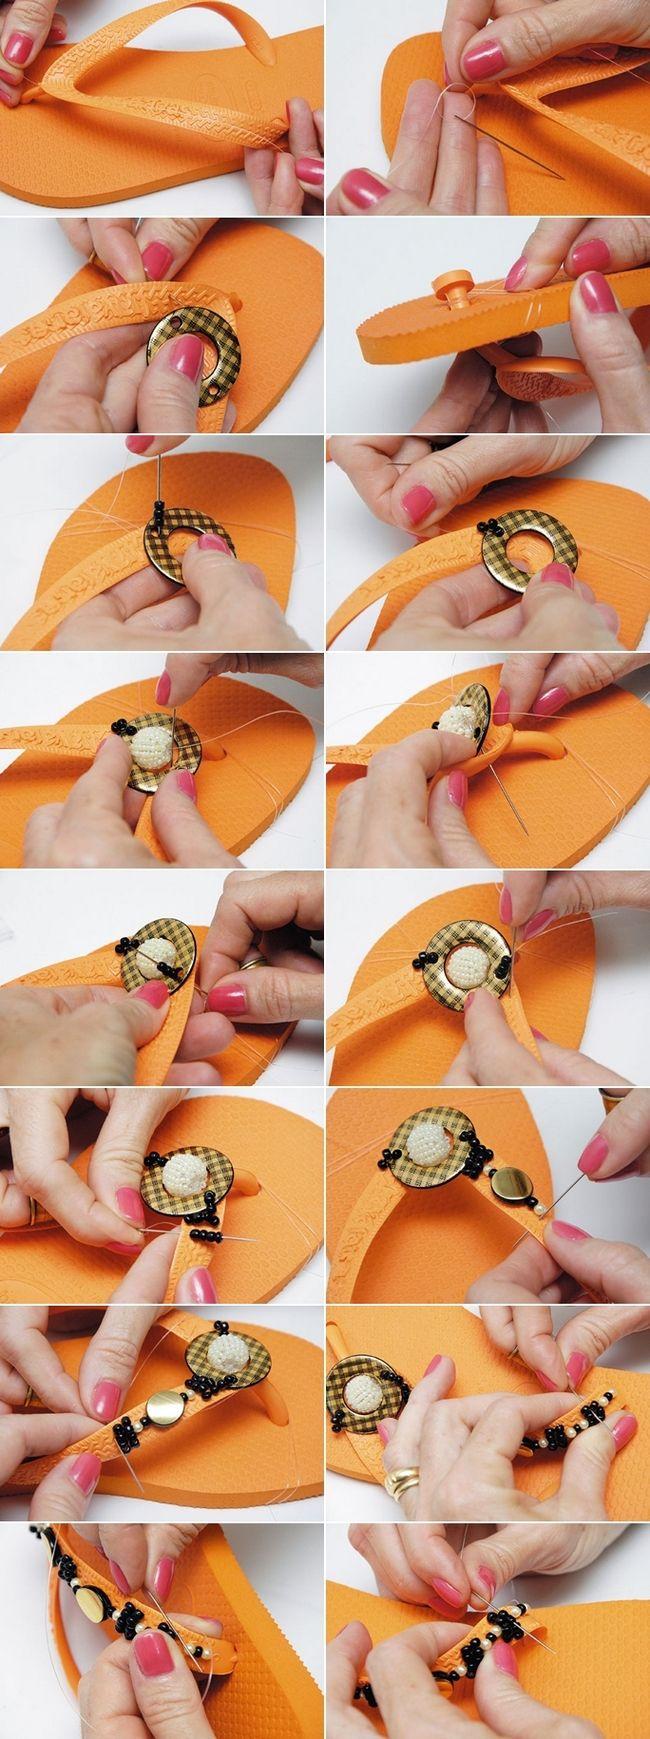 handmade flip flops decorations beads orange black gold. handmade flip flops decorations beads orange black gold